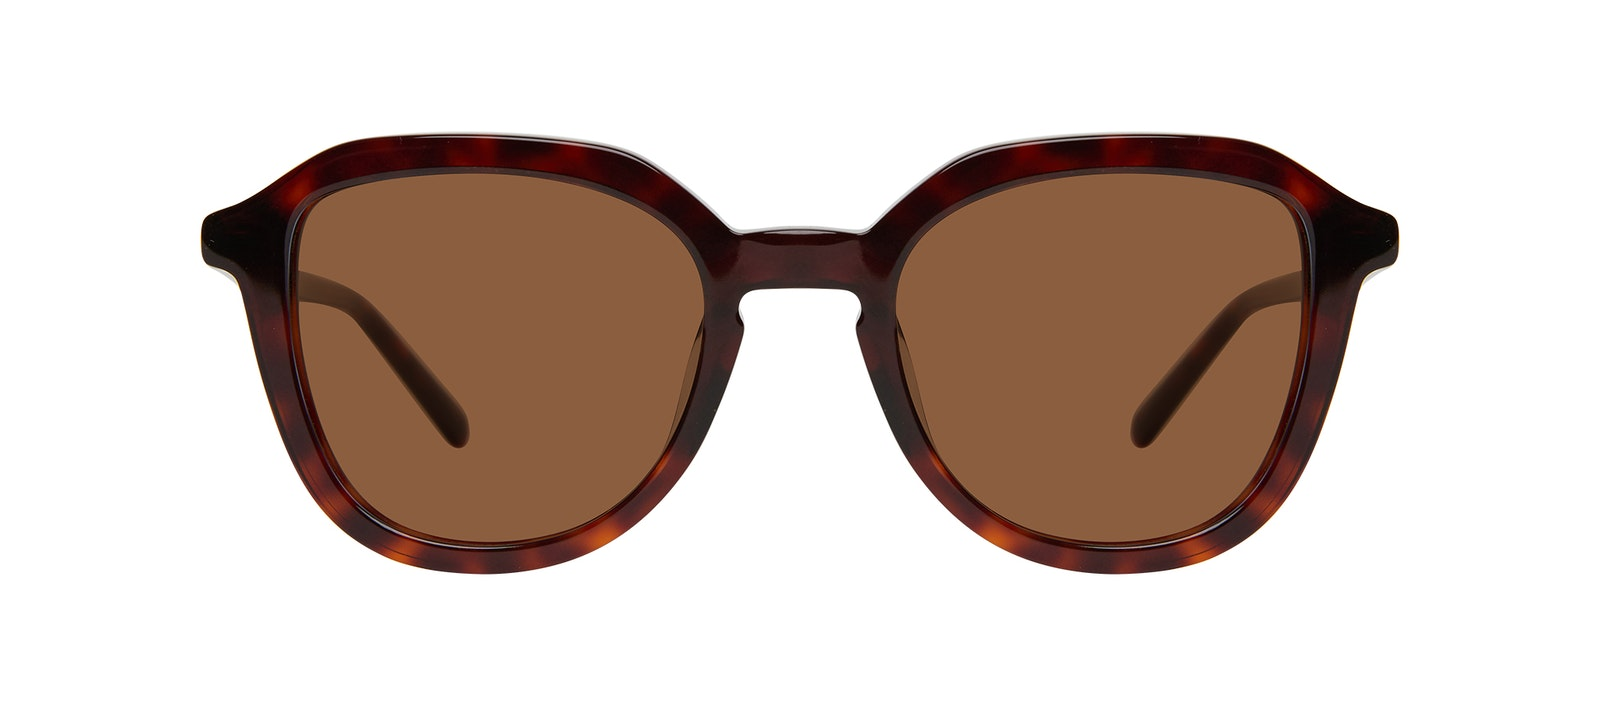 Affordable Fashion Glasses Square Sunglasses Kids Art Junior Tortoise Front